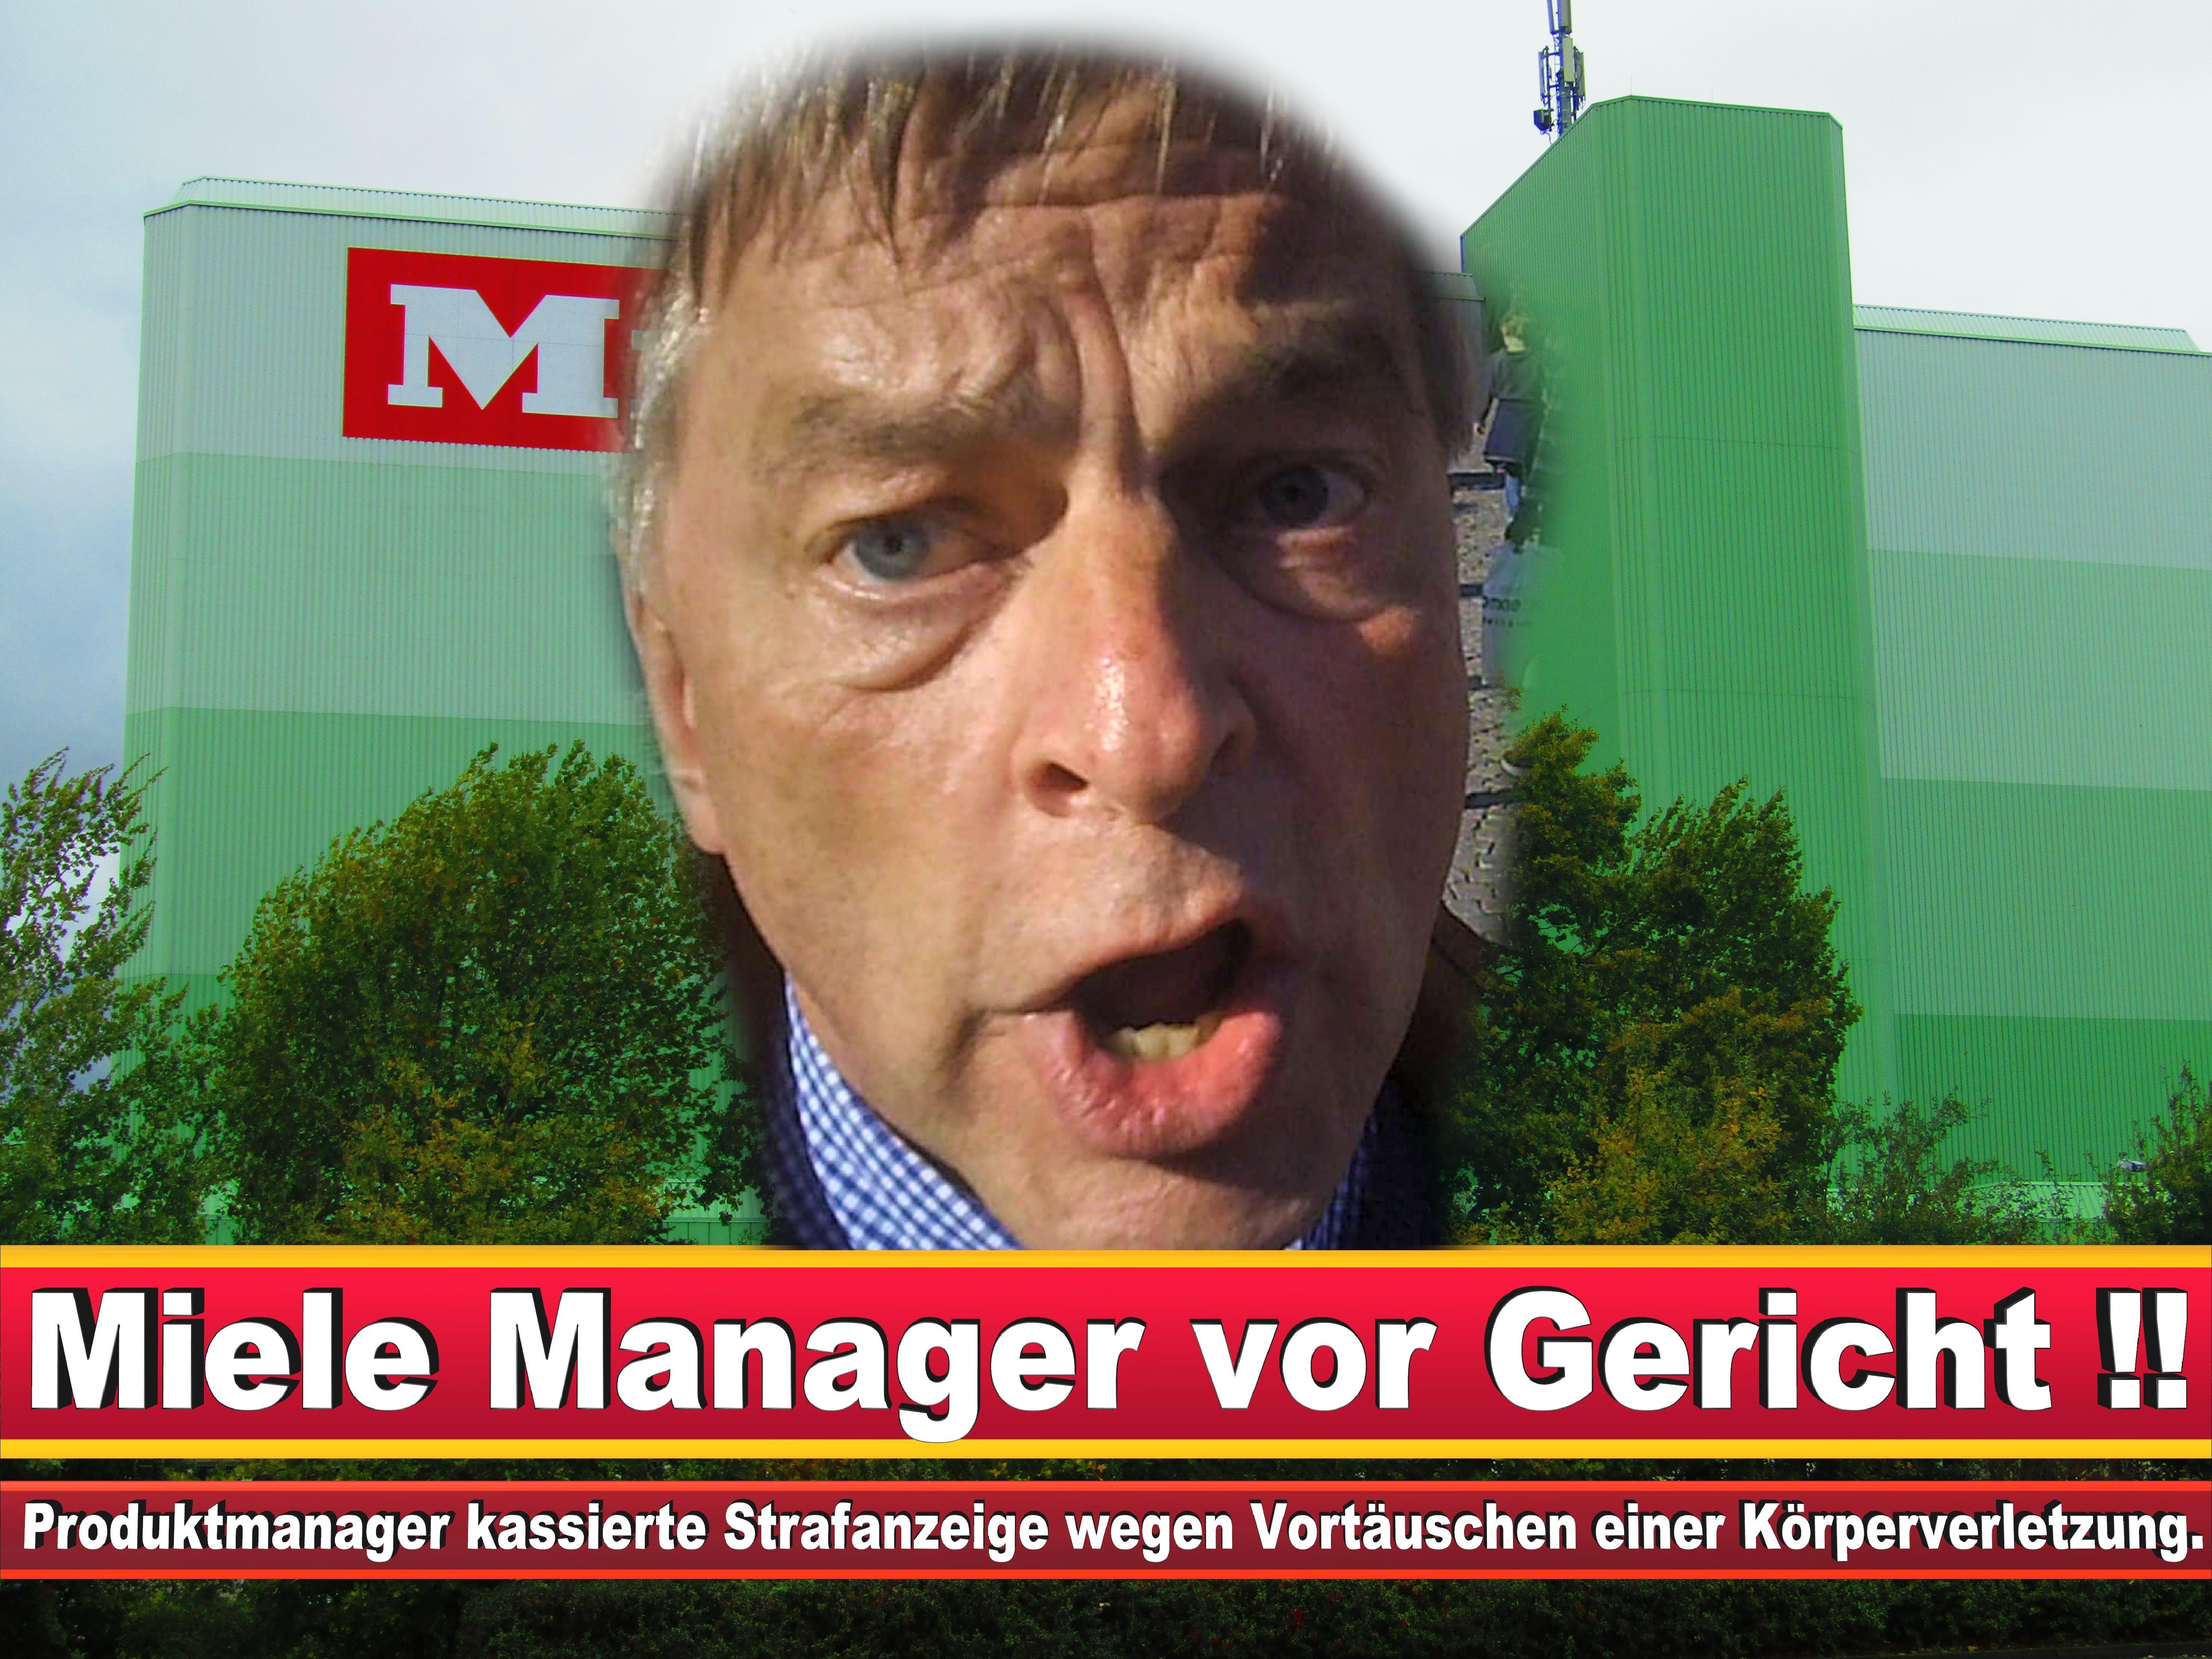 MIELE GÜTERSLOH CARL MIELE STRASSE